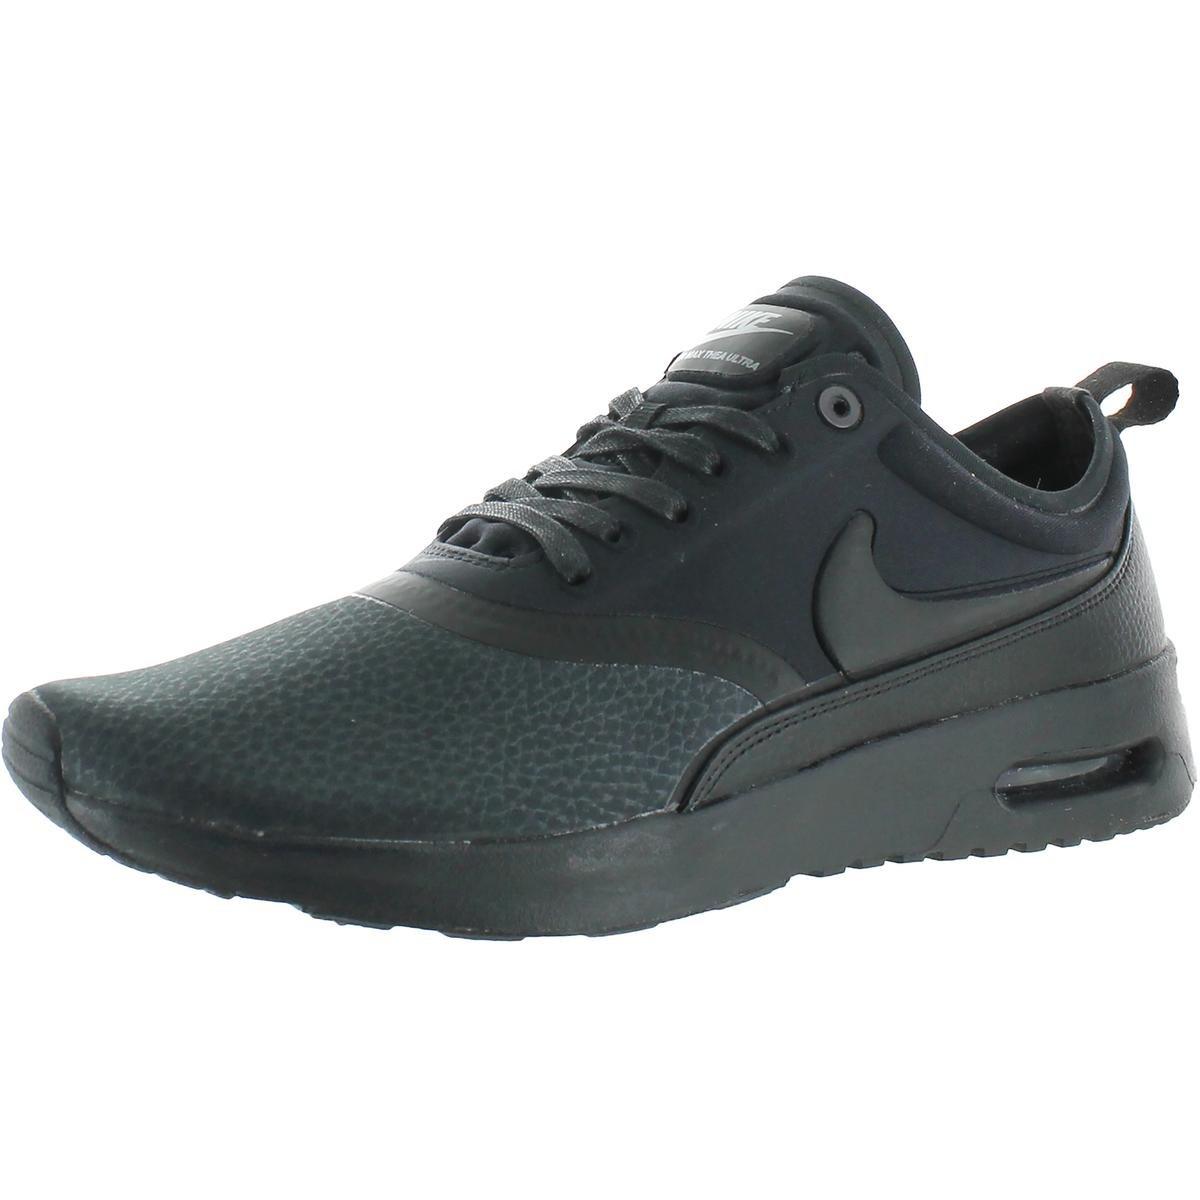 13f3909c97 Galleon - NIKE Womens Air Max Thea Ultra PRM Running Shoes Black 5 Medium  (B,M)